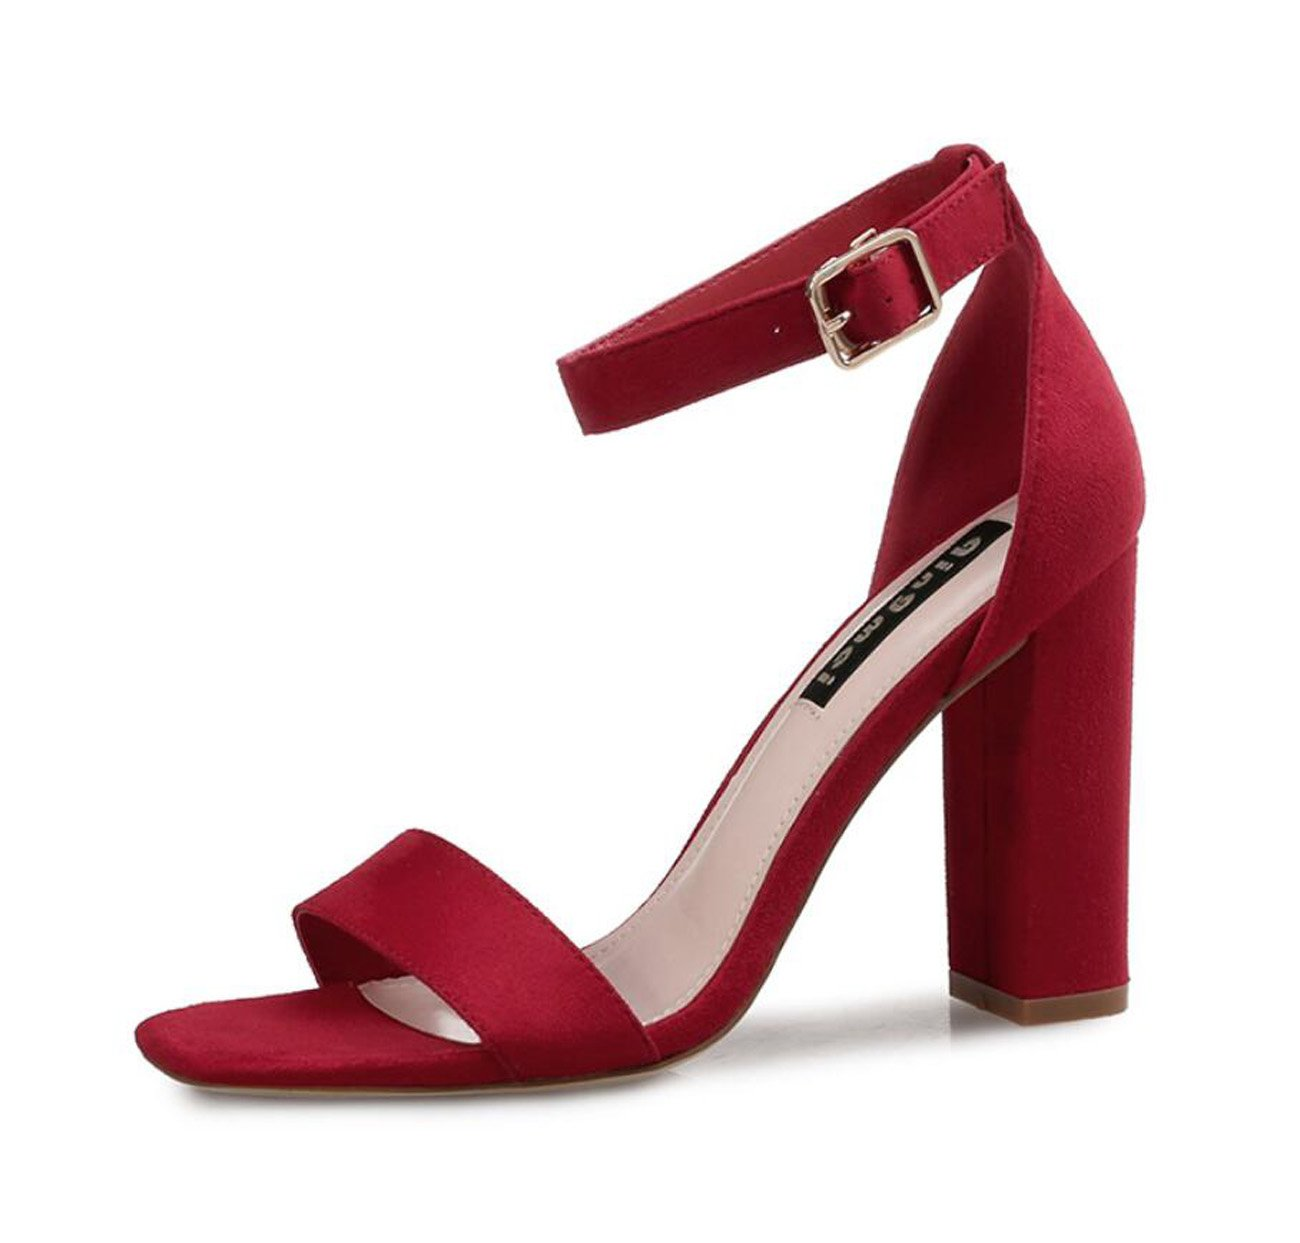 ZXMXY Damen Damen Block High Heels Sandalen Knöchelriemen Peep Toe Strappy Sandalen Schuhe Pumps Party Größe Sandalen im Freien